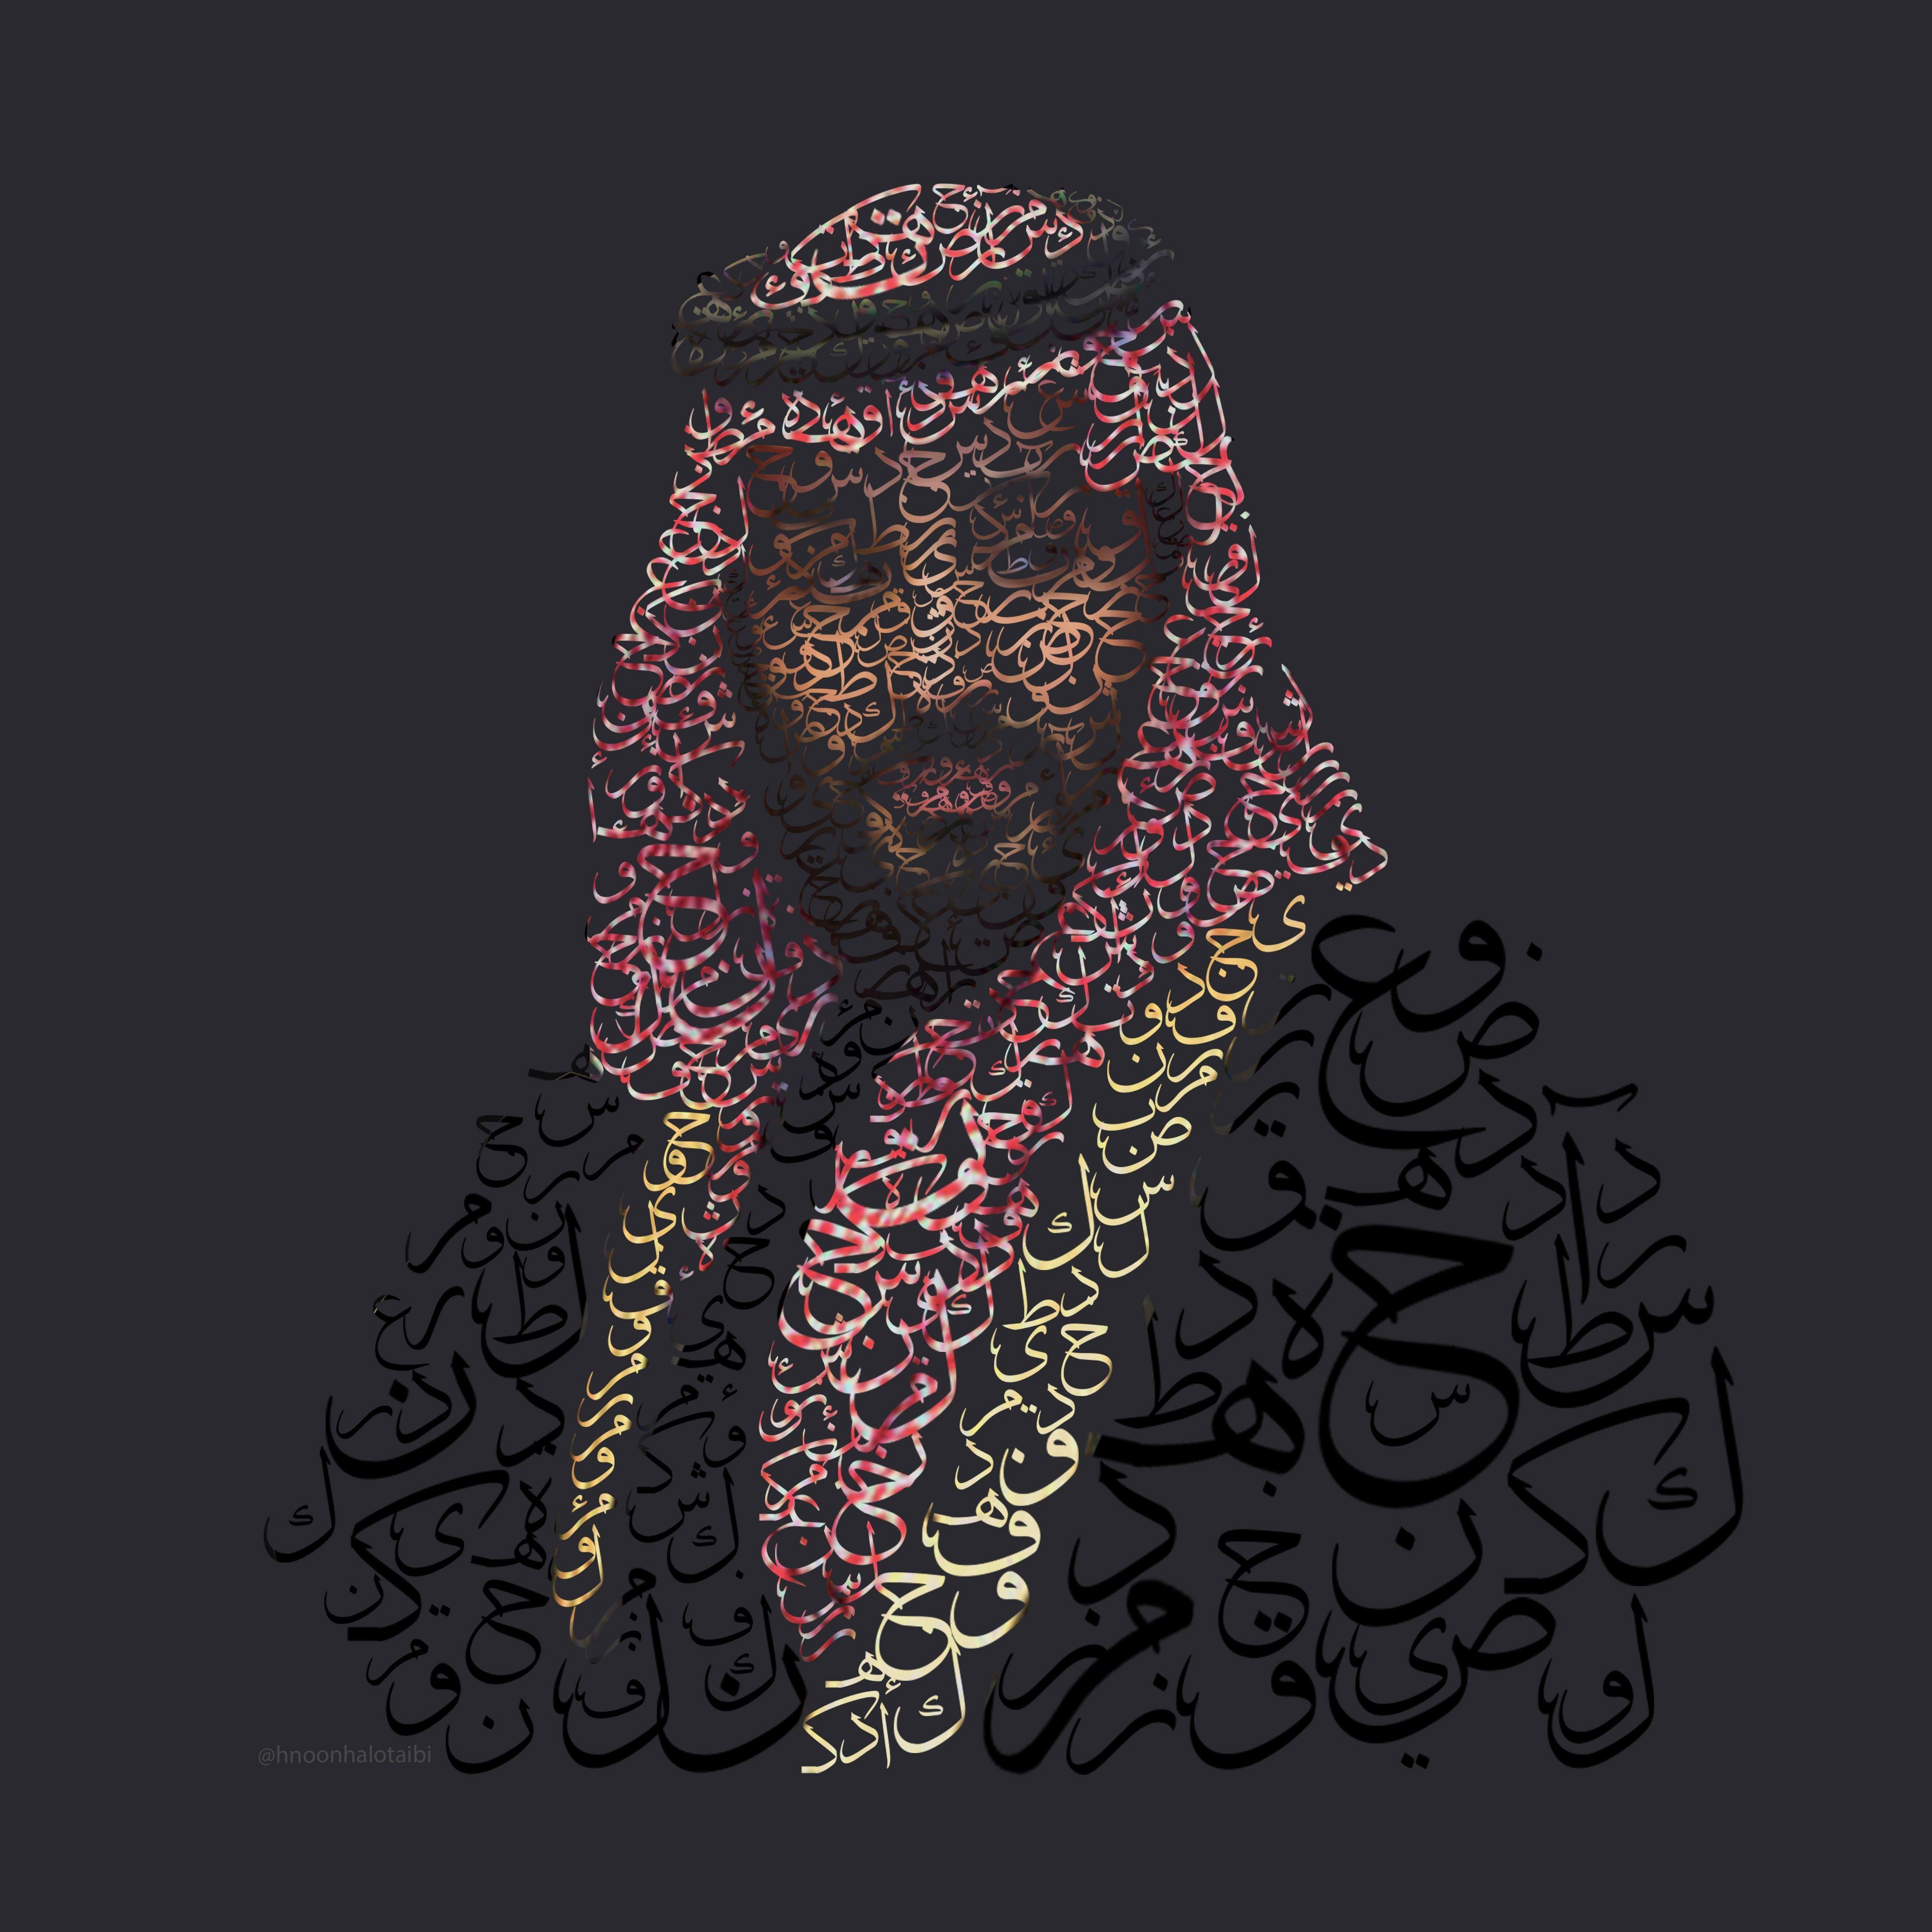 الامير محمد بن سلمان فنكيلي Iphone Wallpaper Pattern Gold Abstract Wallpaper Wallpaper Doodle